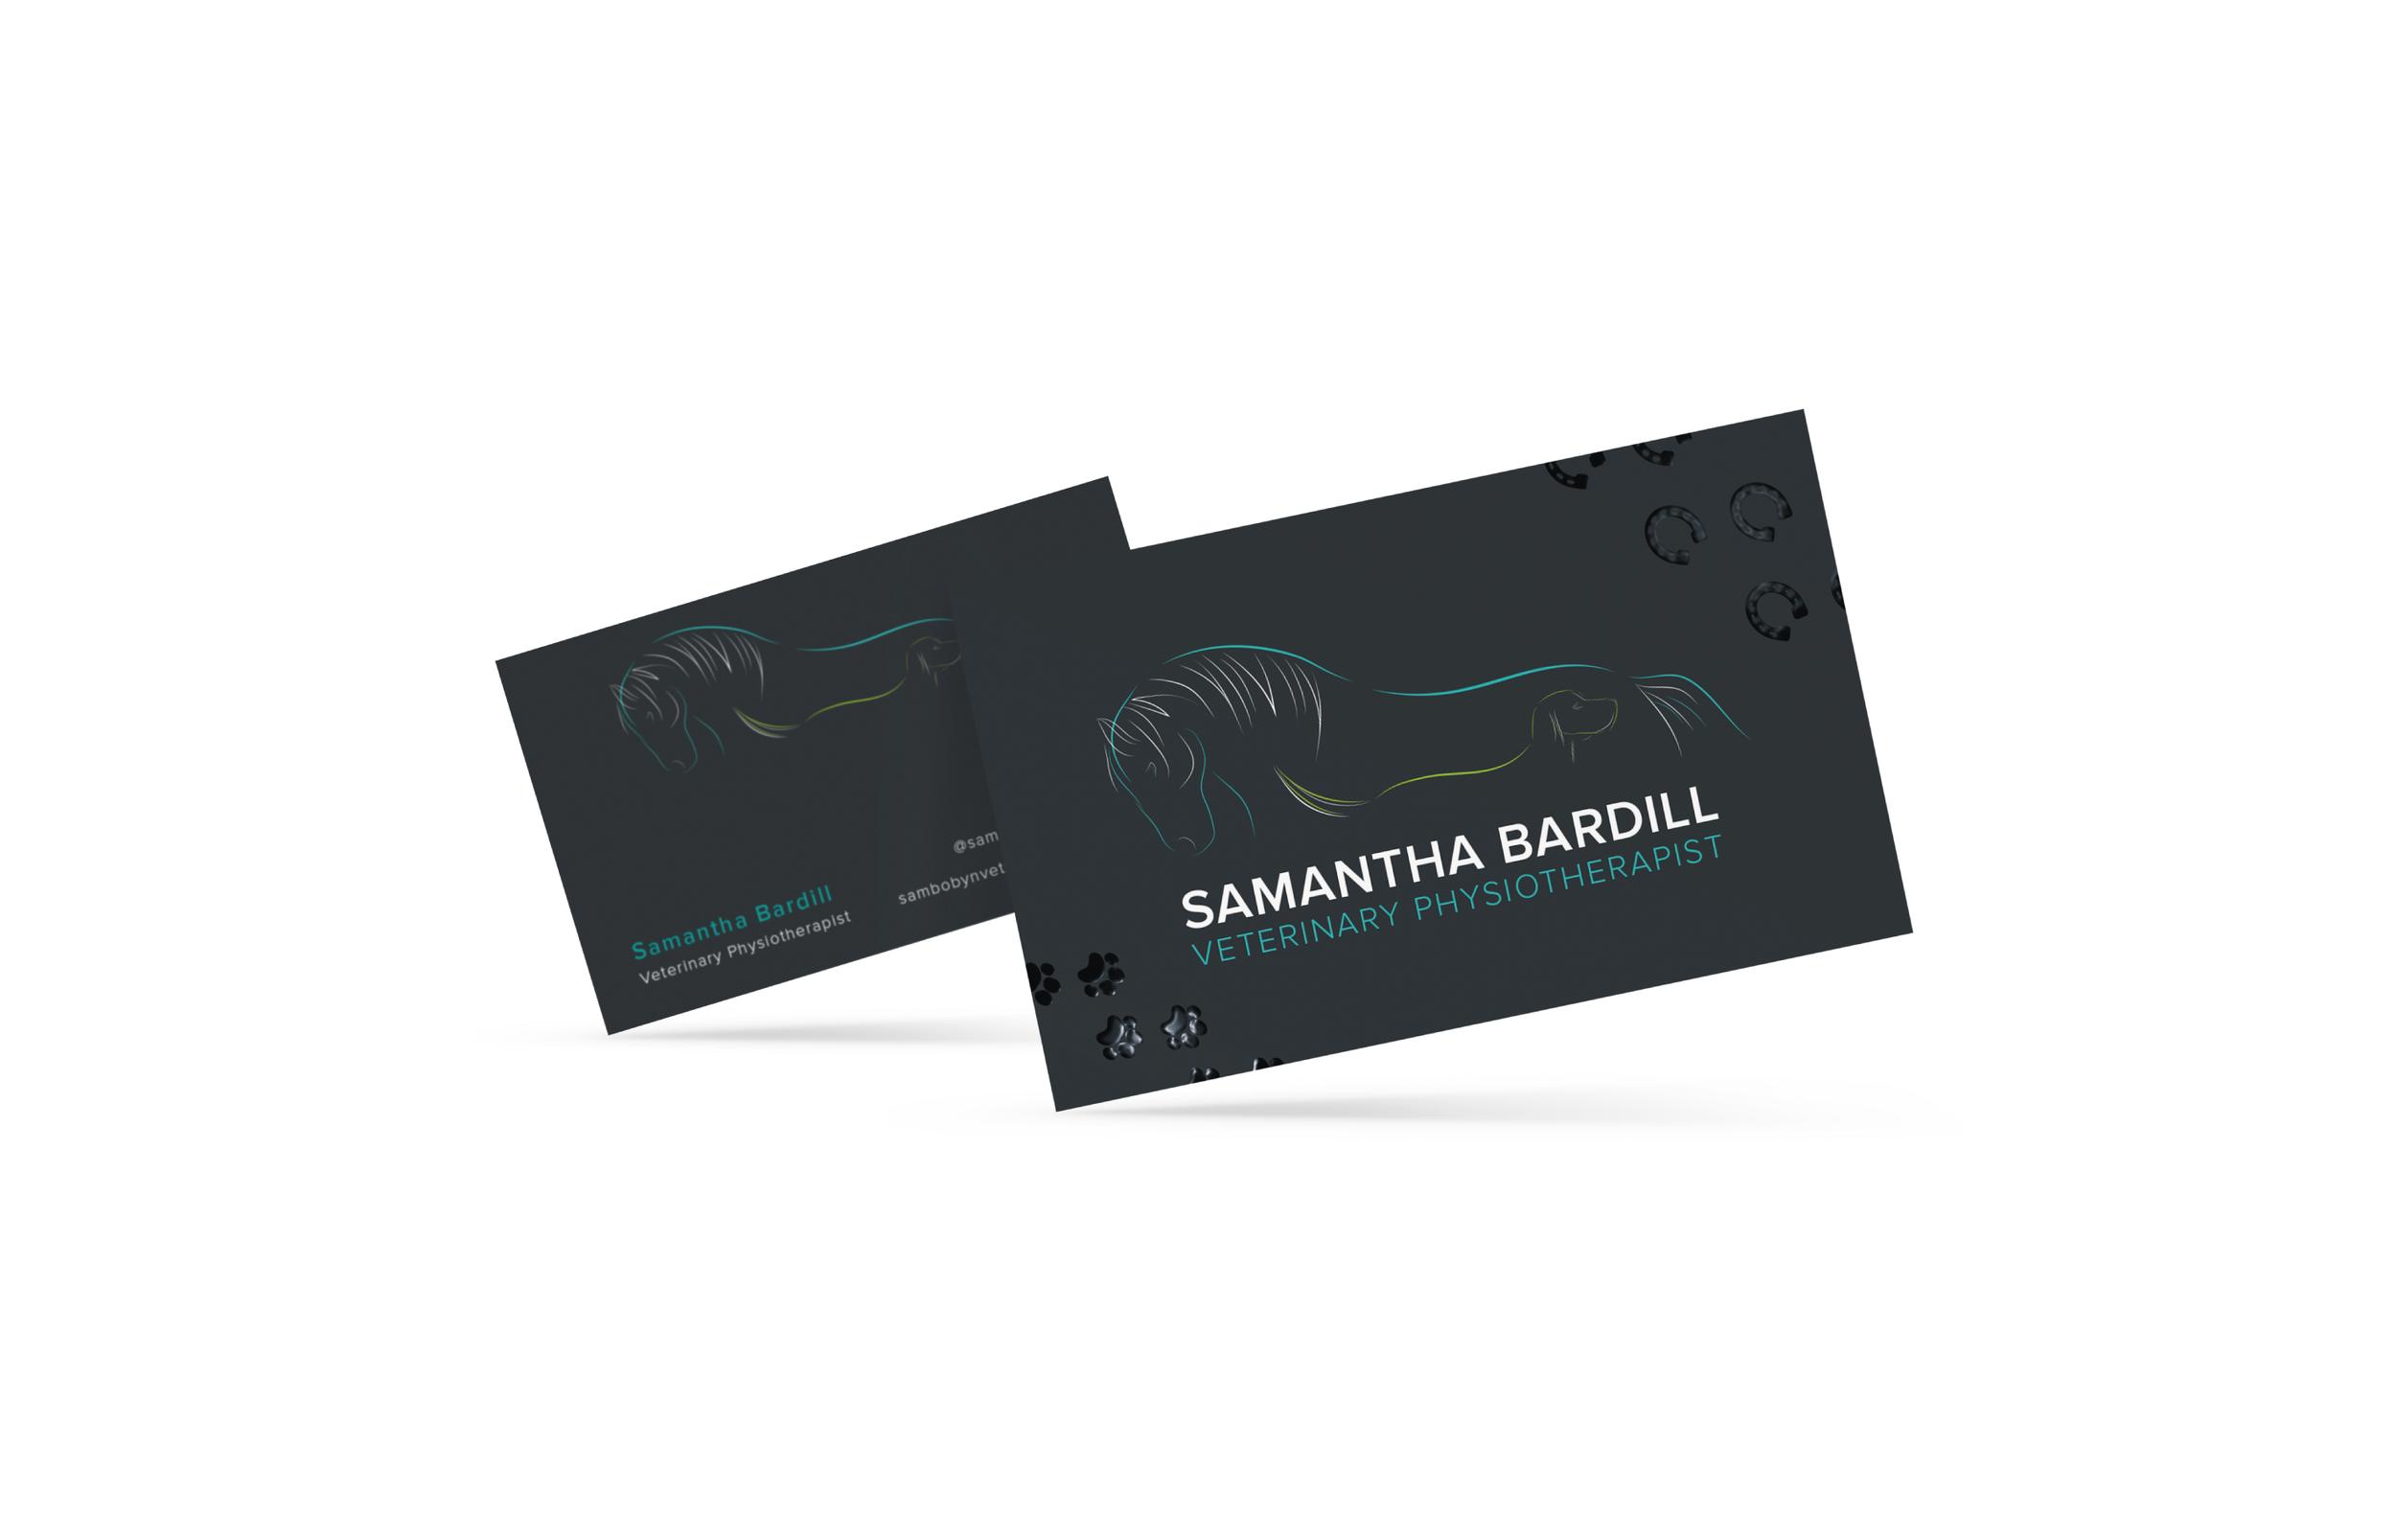 SPOT UV Veterinary Physiotherapist Business Card Design